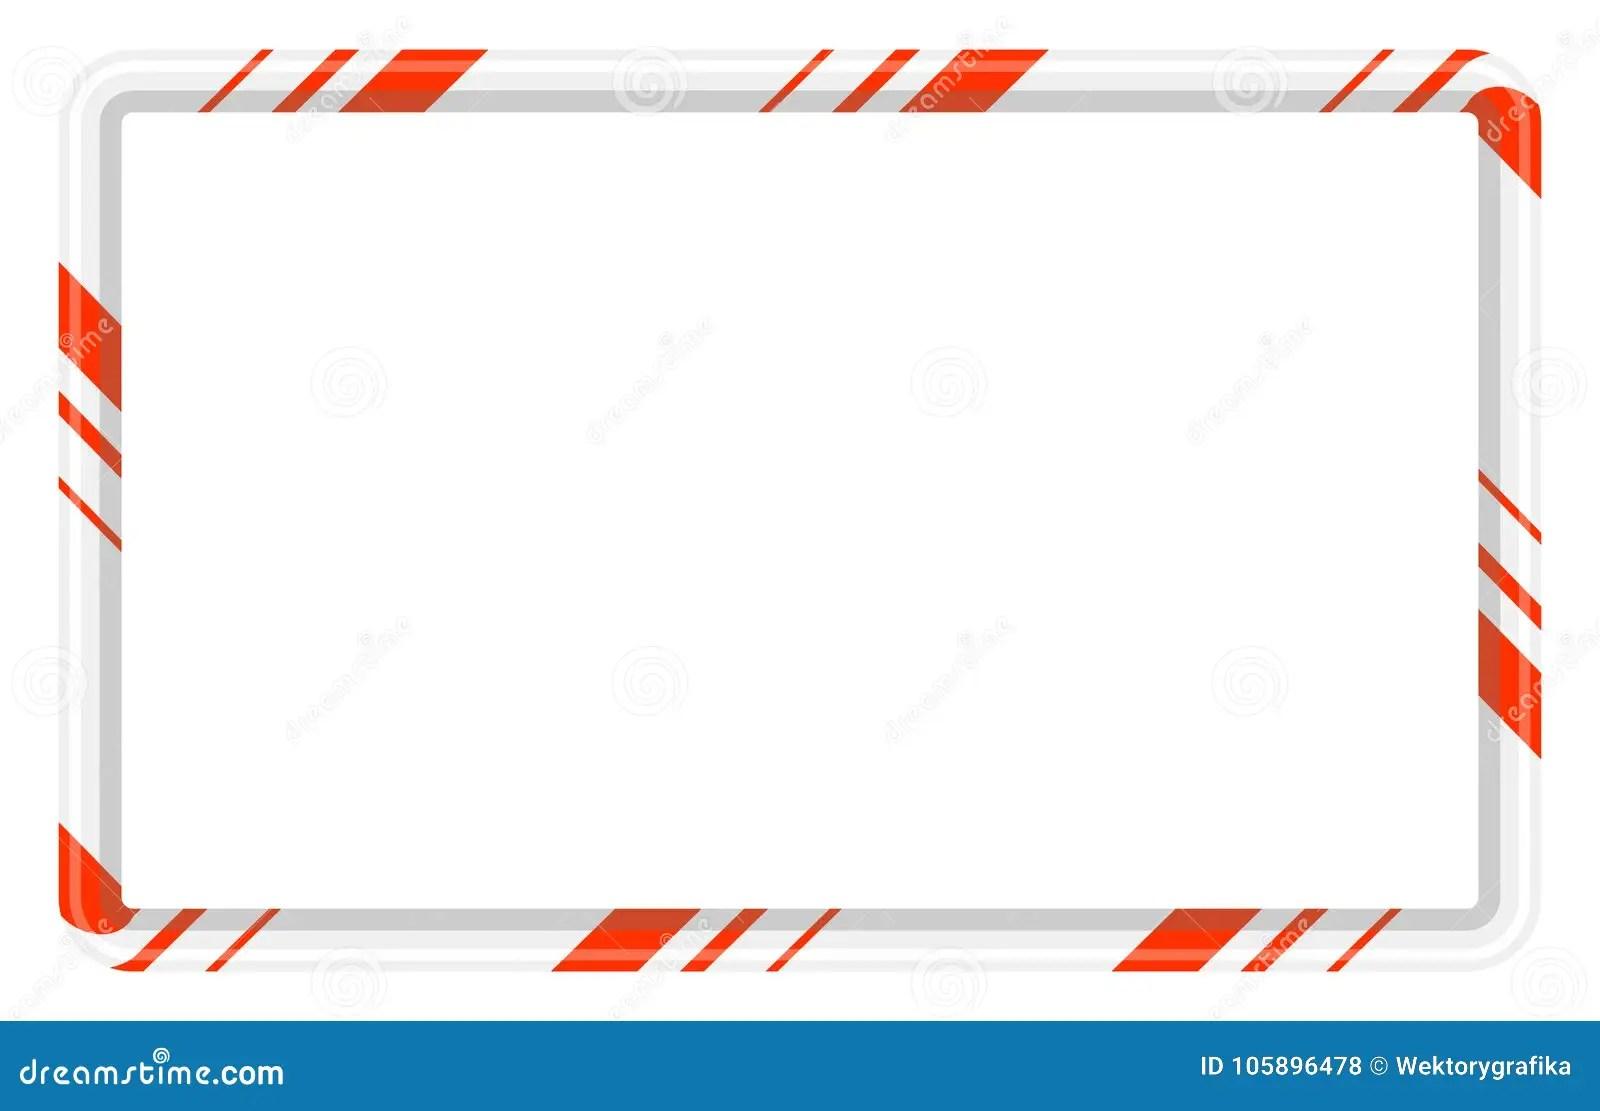 hight resolution of candy cane frame border for christmas design on white b